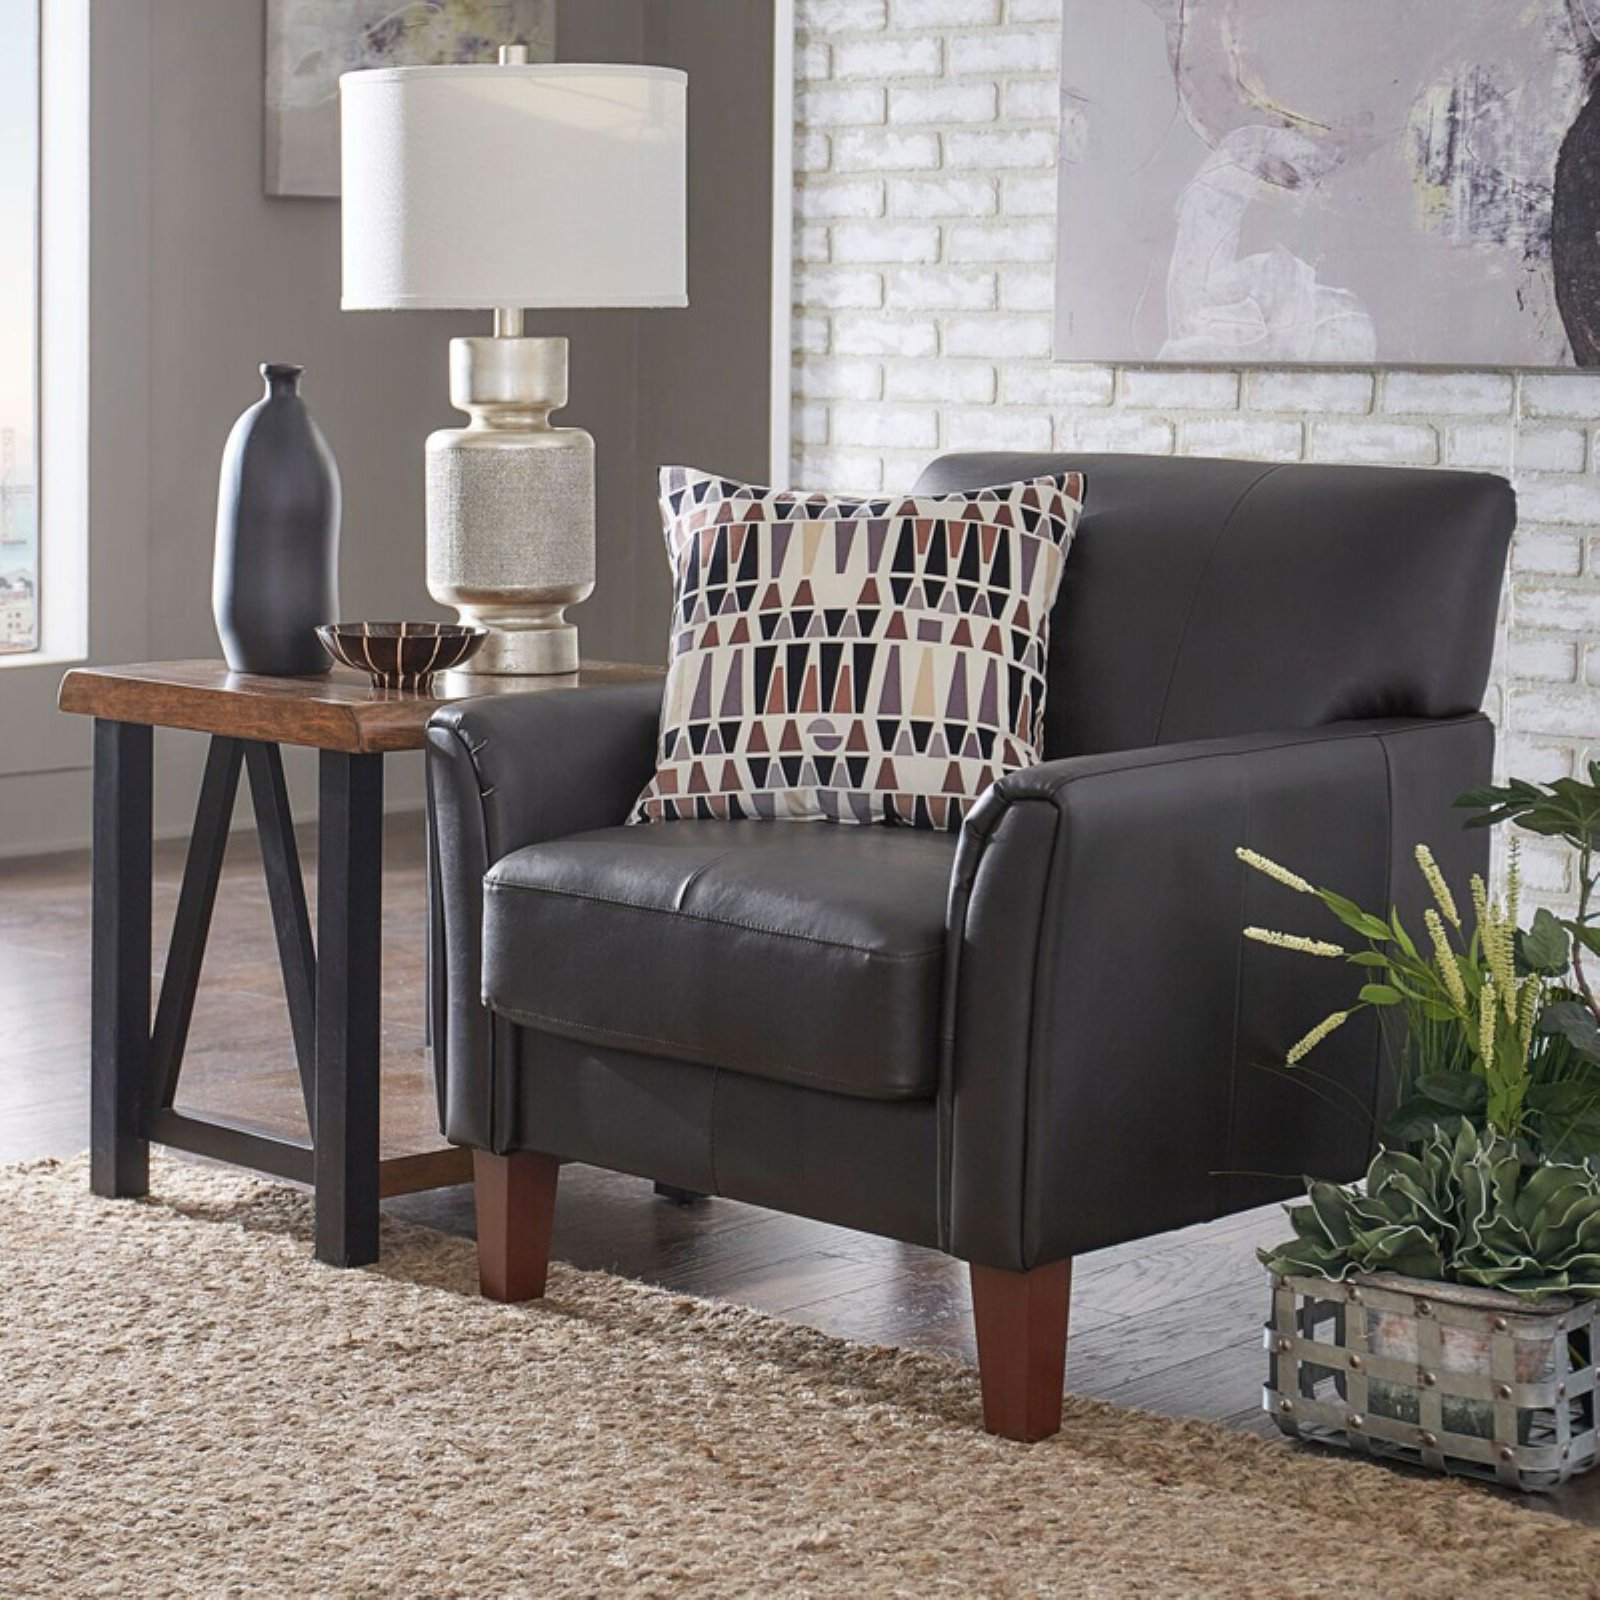 Weston Home Tribeca Living Room Accent Chair Chocolate Vinyl Chair Walmart Com